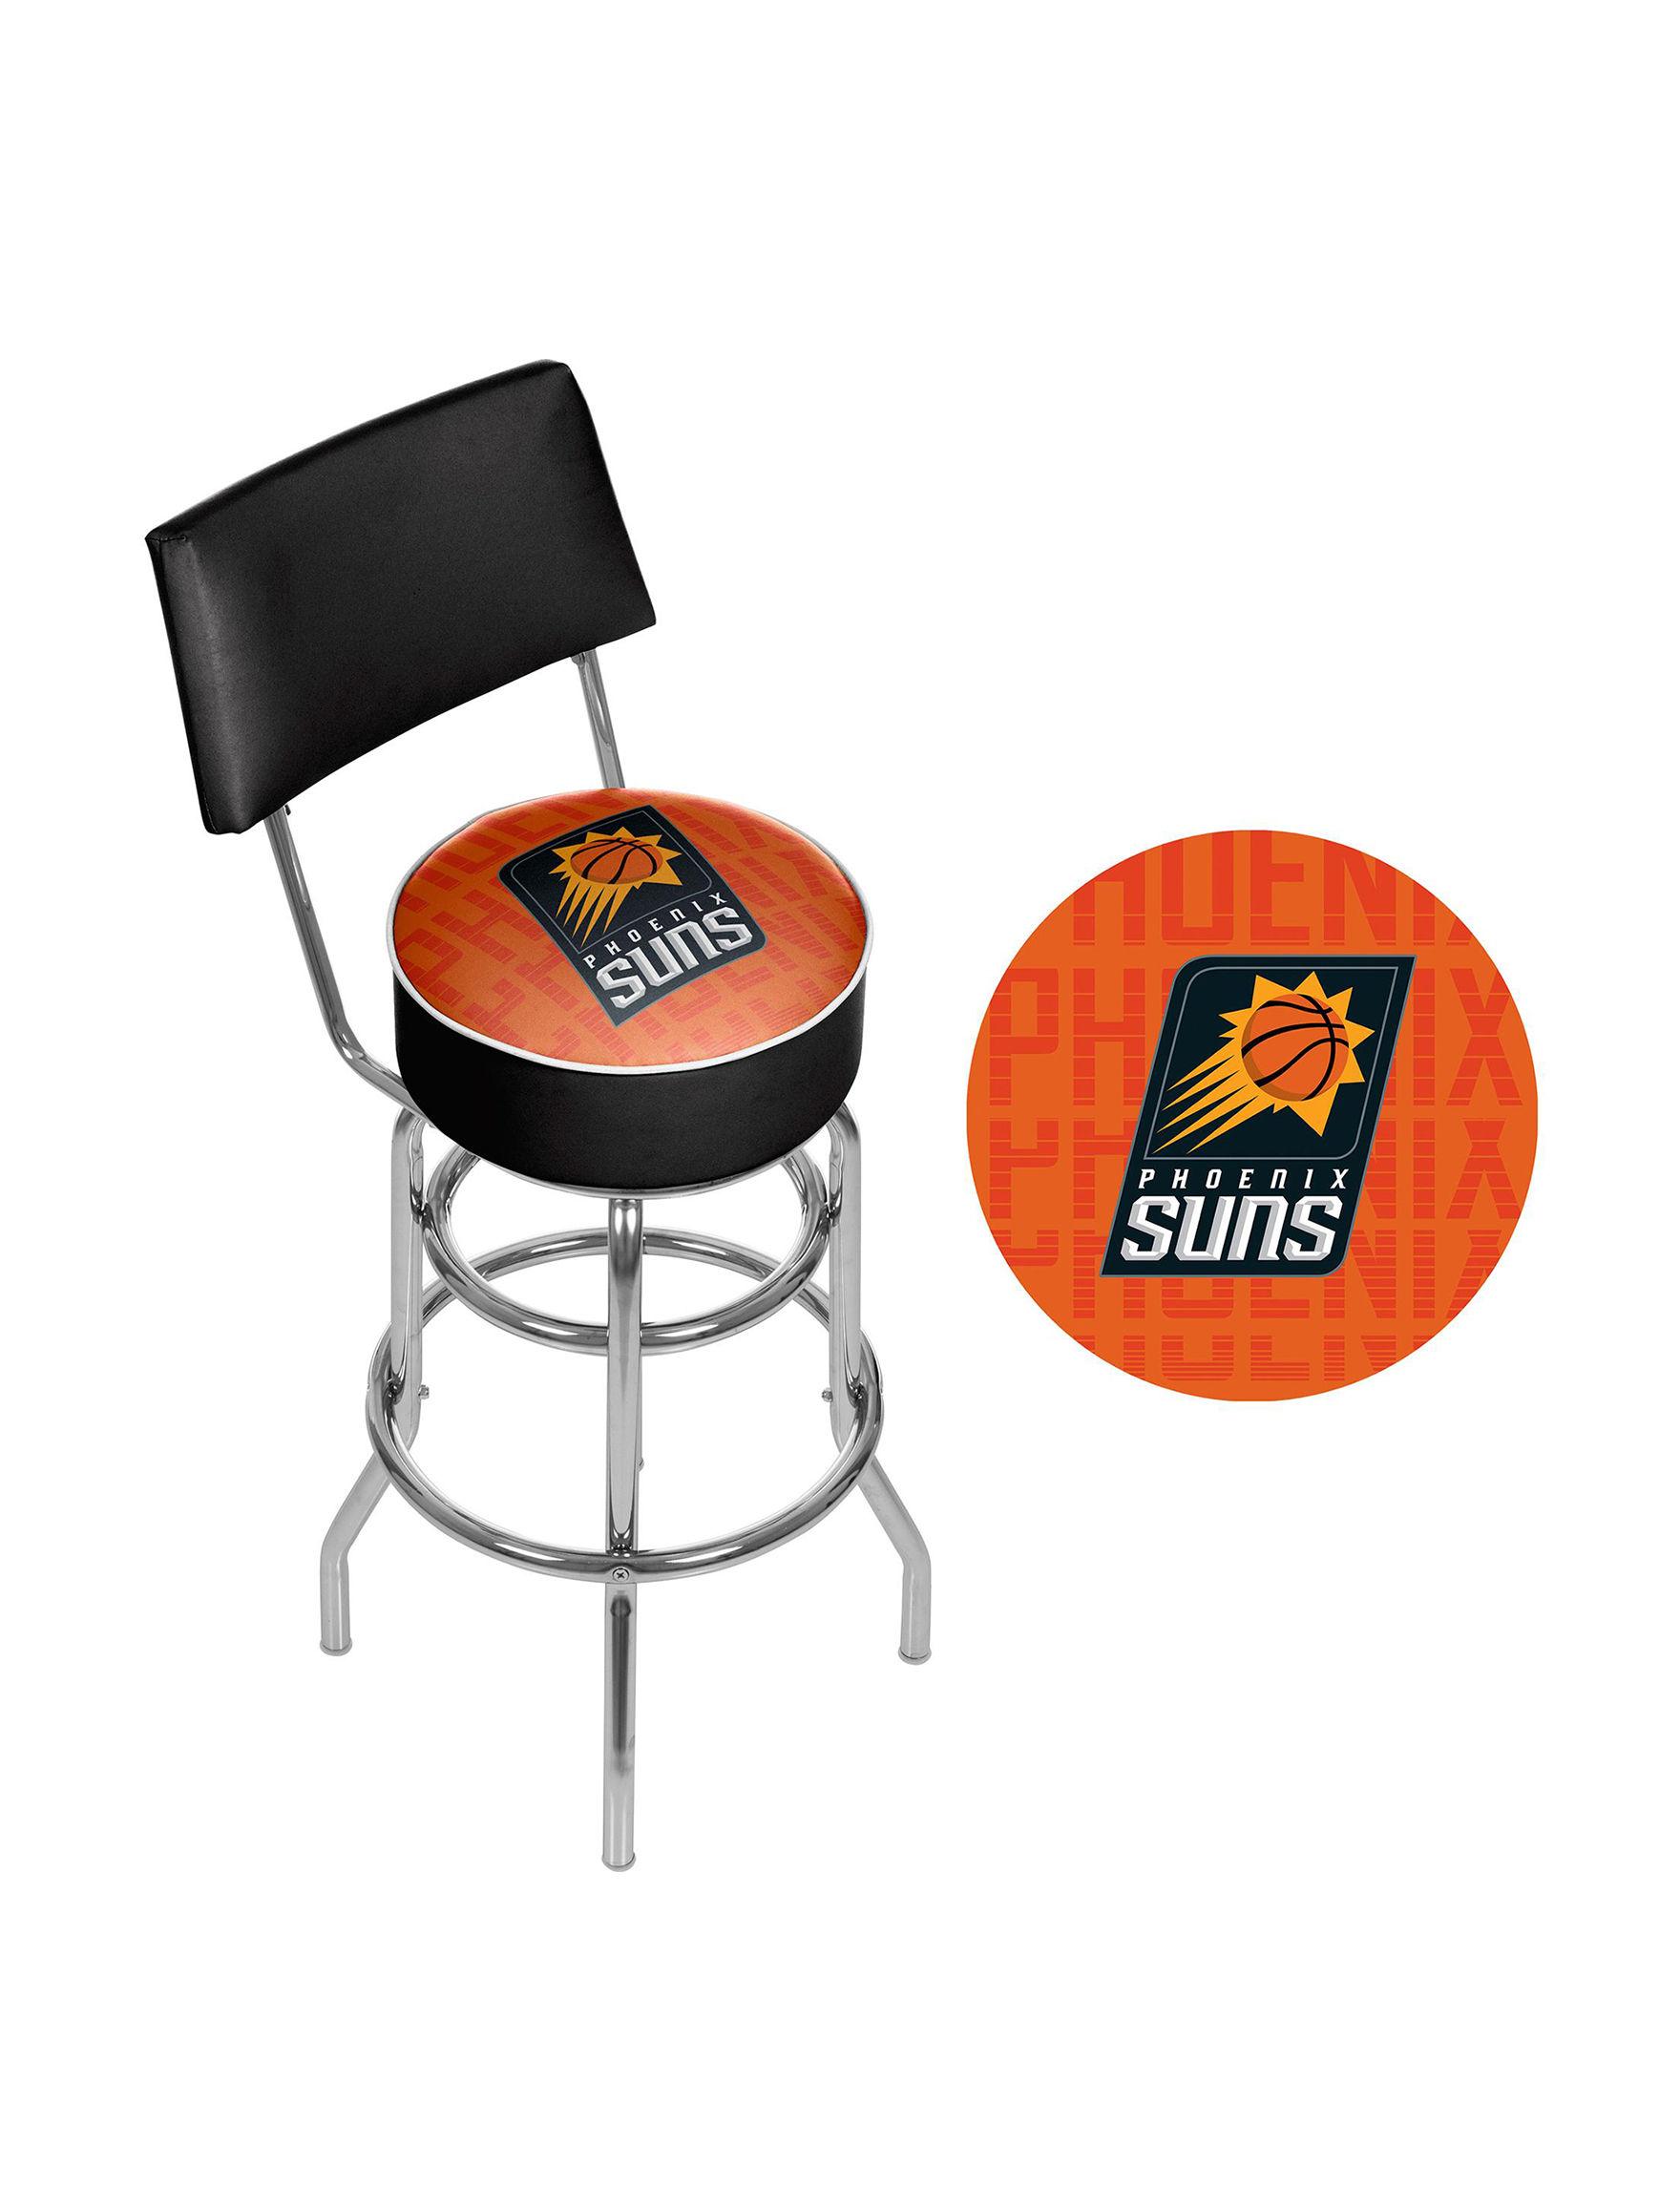 Trademark Global Orange / Black Bar & Kitchen Stools Game Room Kitchen & Dining Furniture